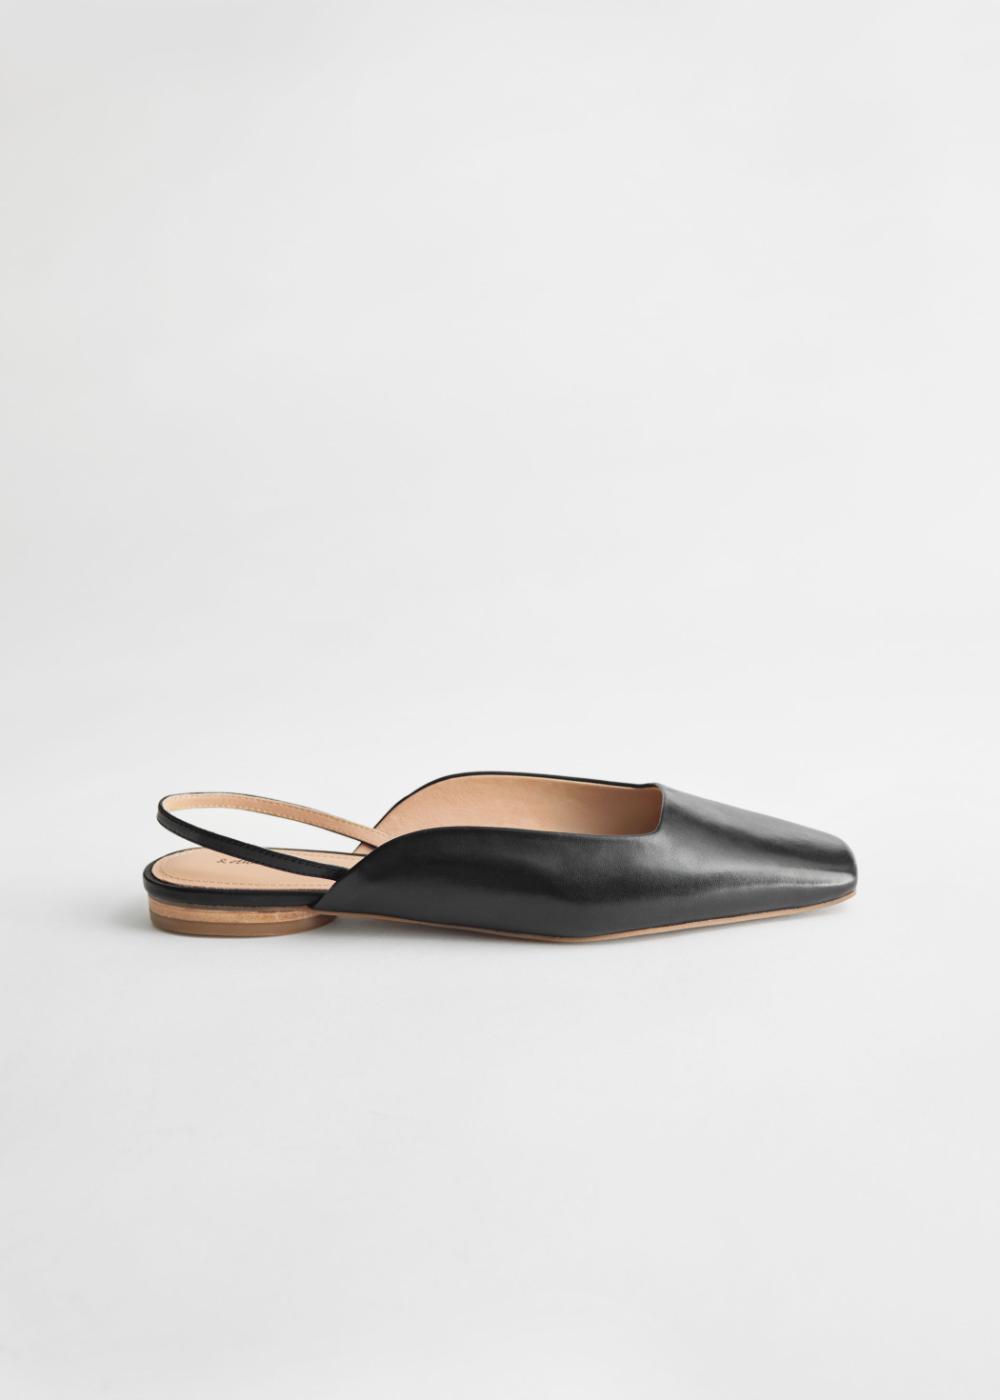 Leather Square Toe Ballerina Flats in 2020 | Black flats